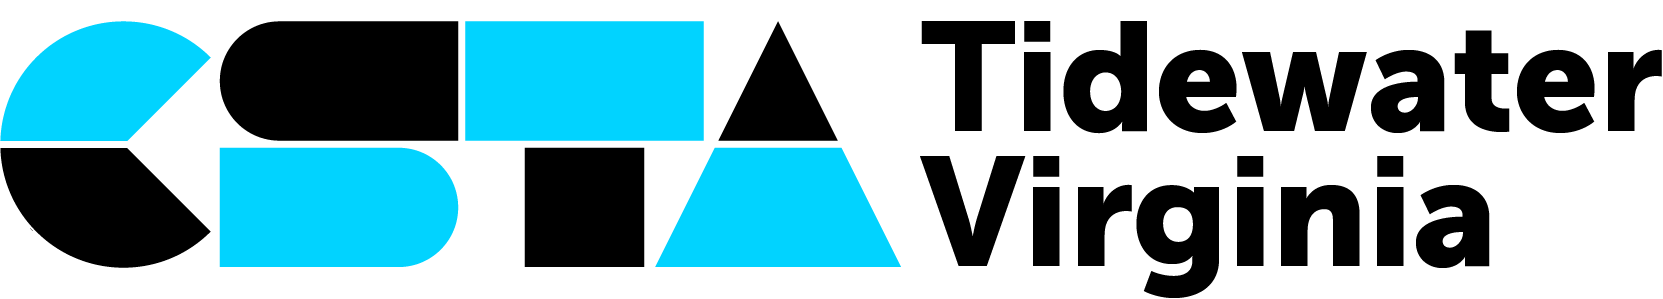 Tidewater Virginia logo